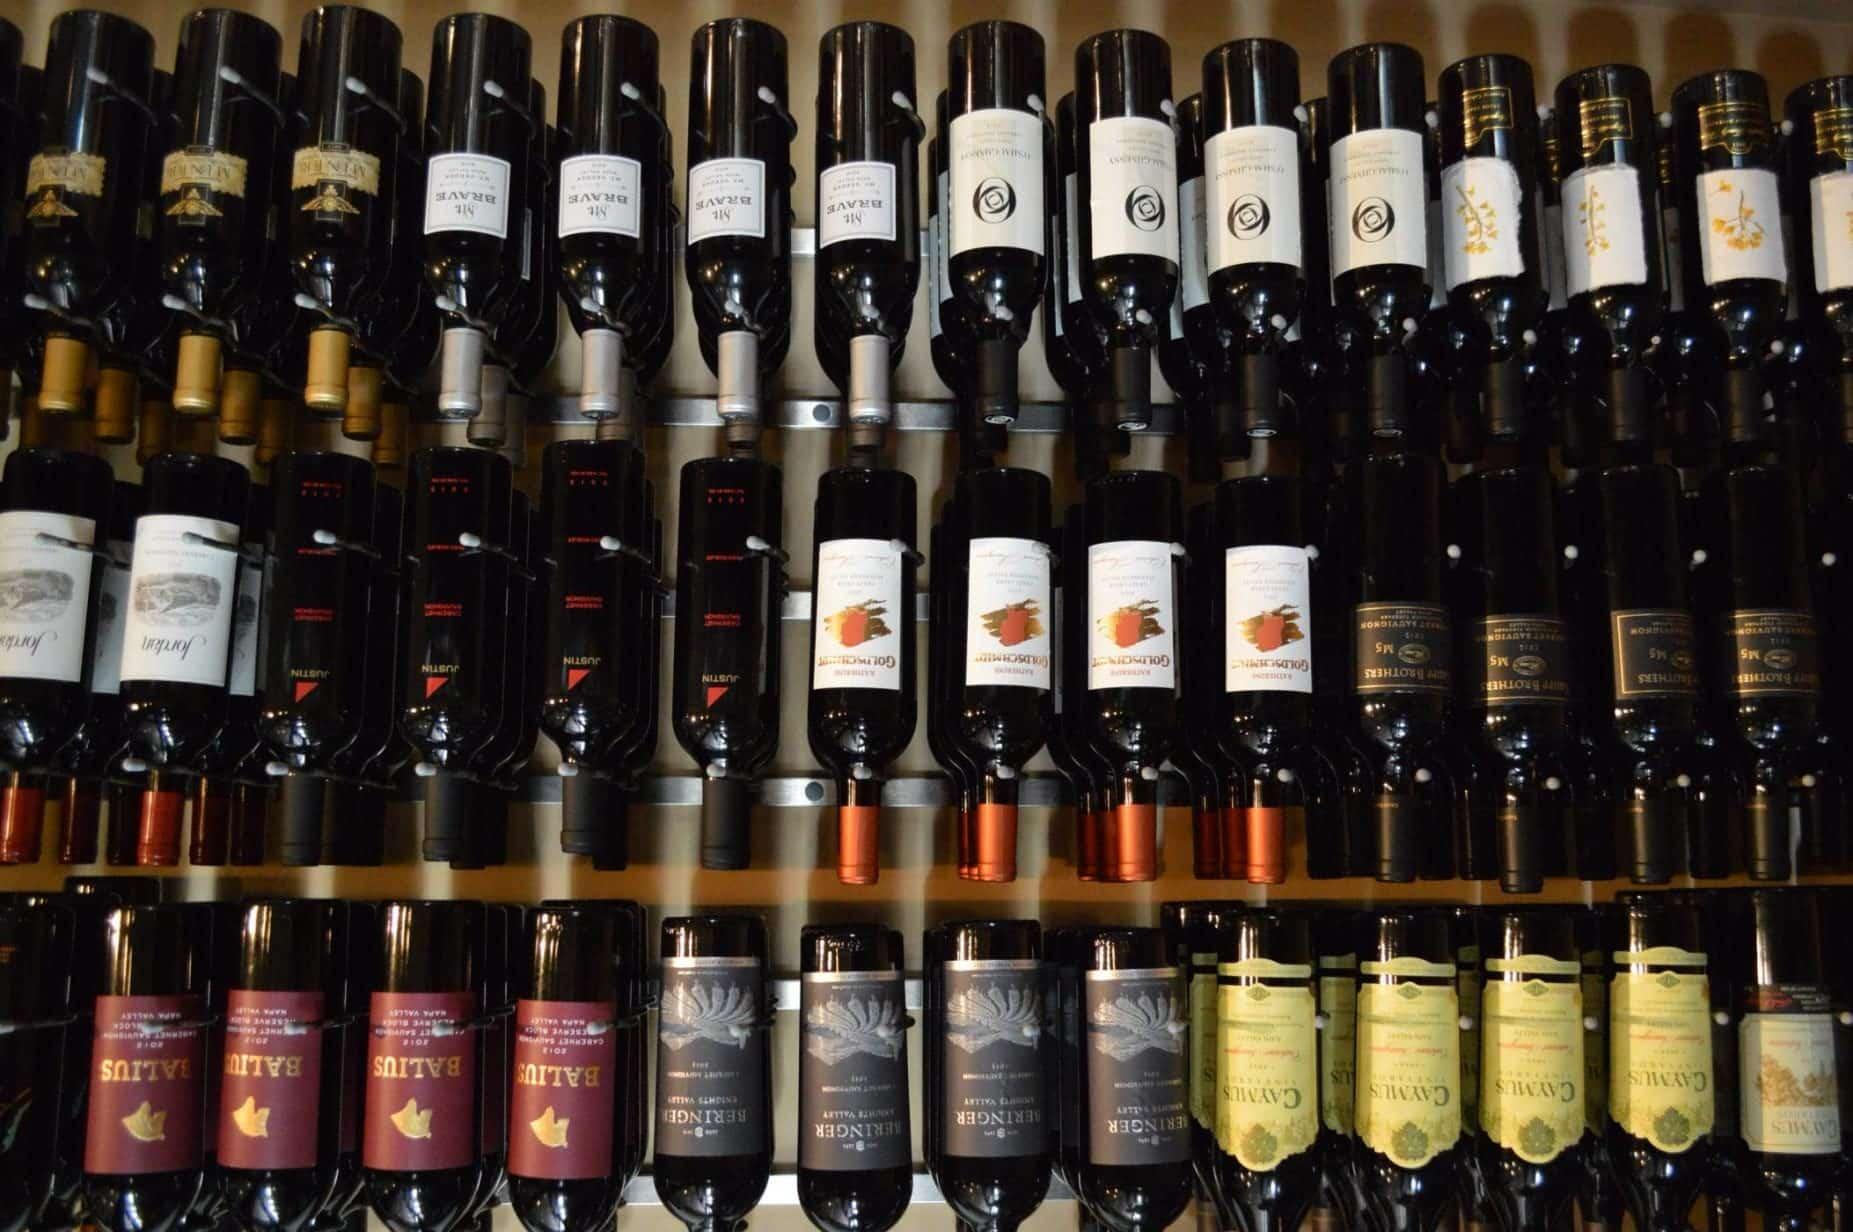 Label Forward Bottle Orientation VintageView Wine Racks